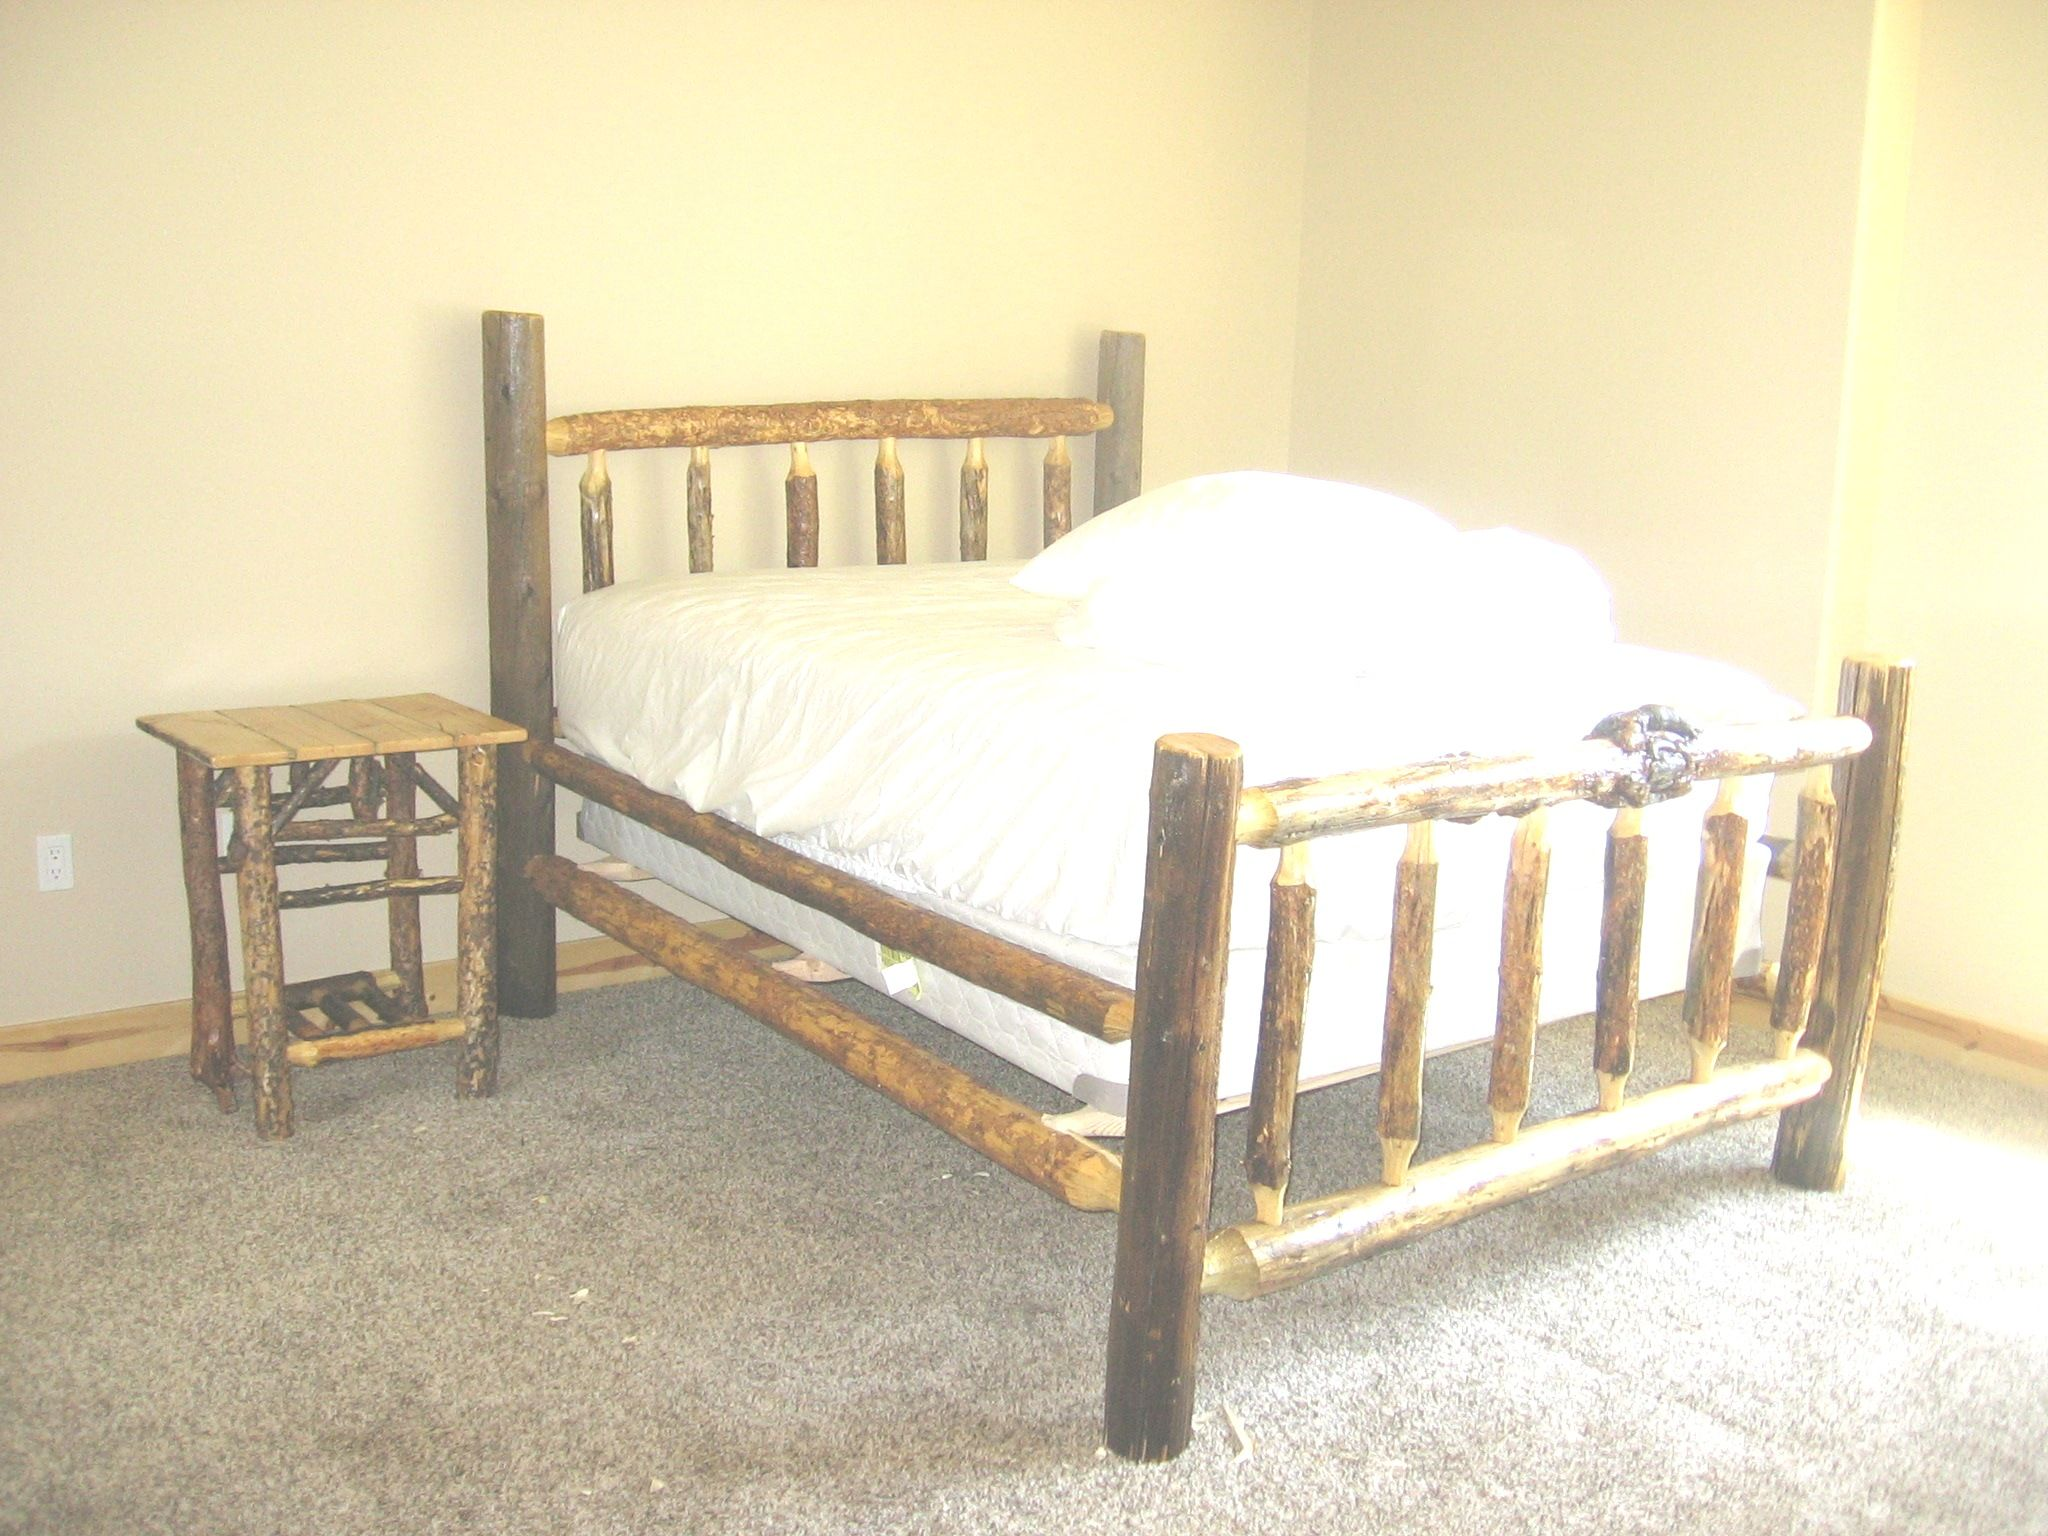 Custom aspen kind size bed in Texas. Visit www